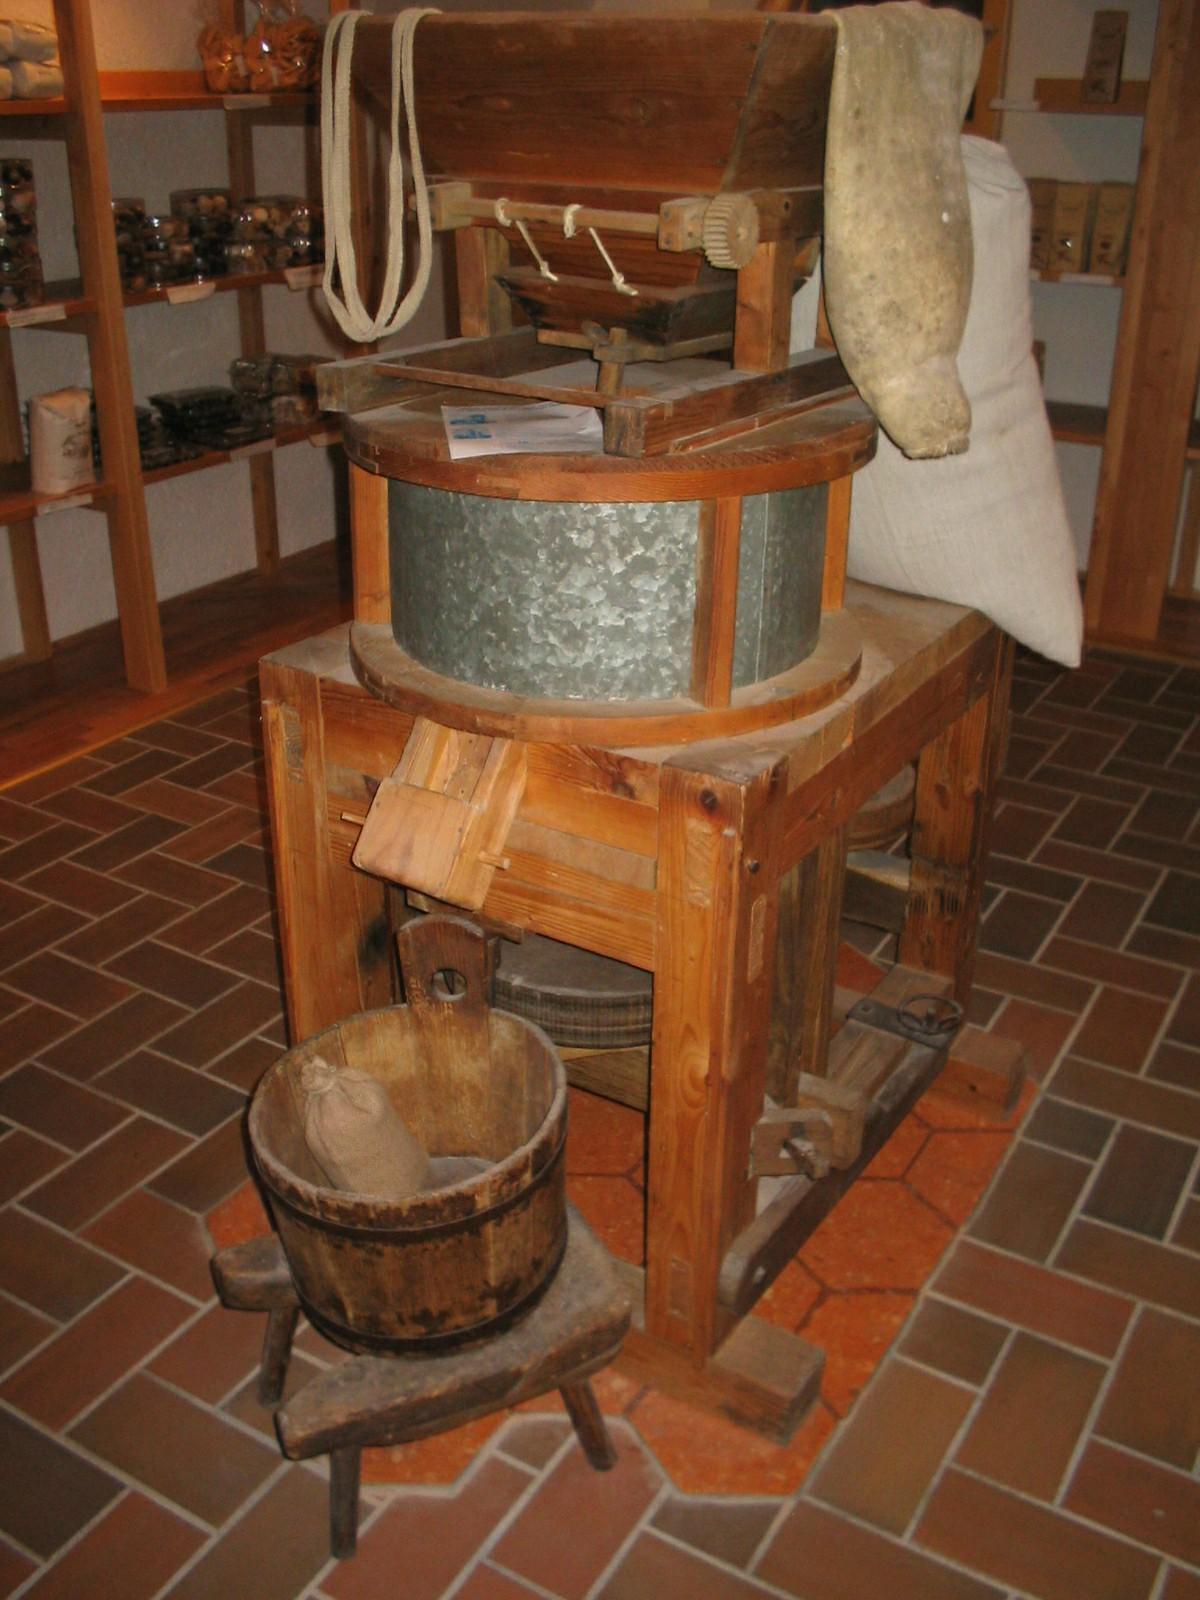 FormatFactoryBrineƒev mlin- Star mlin, foto arhiv Brineƒev mlin, Savinja Valley